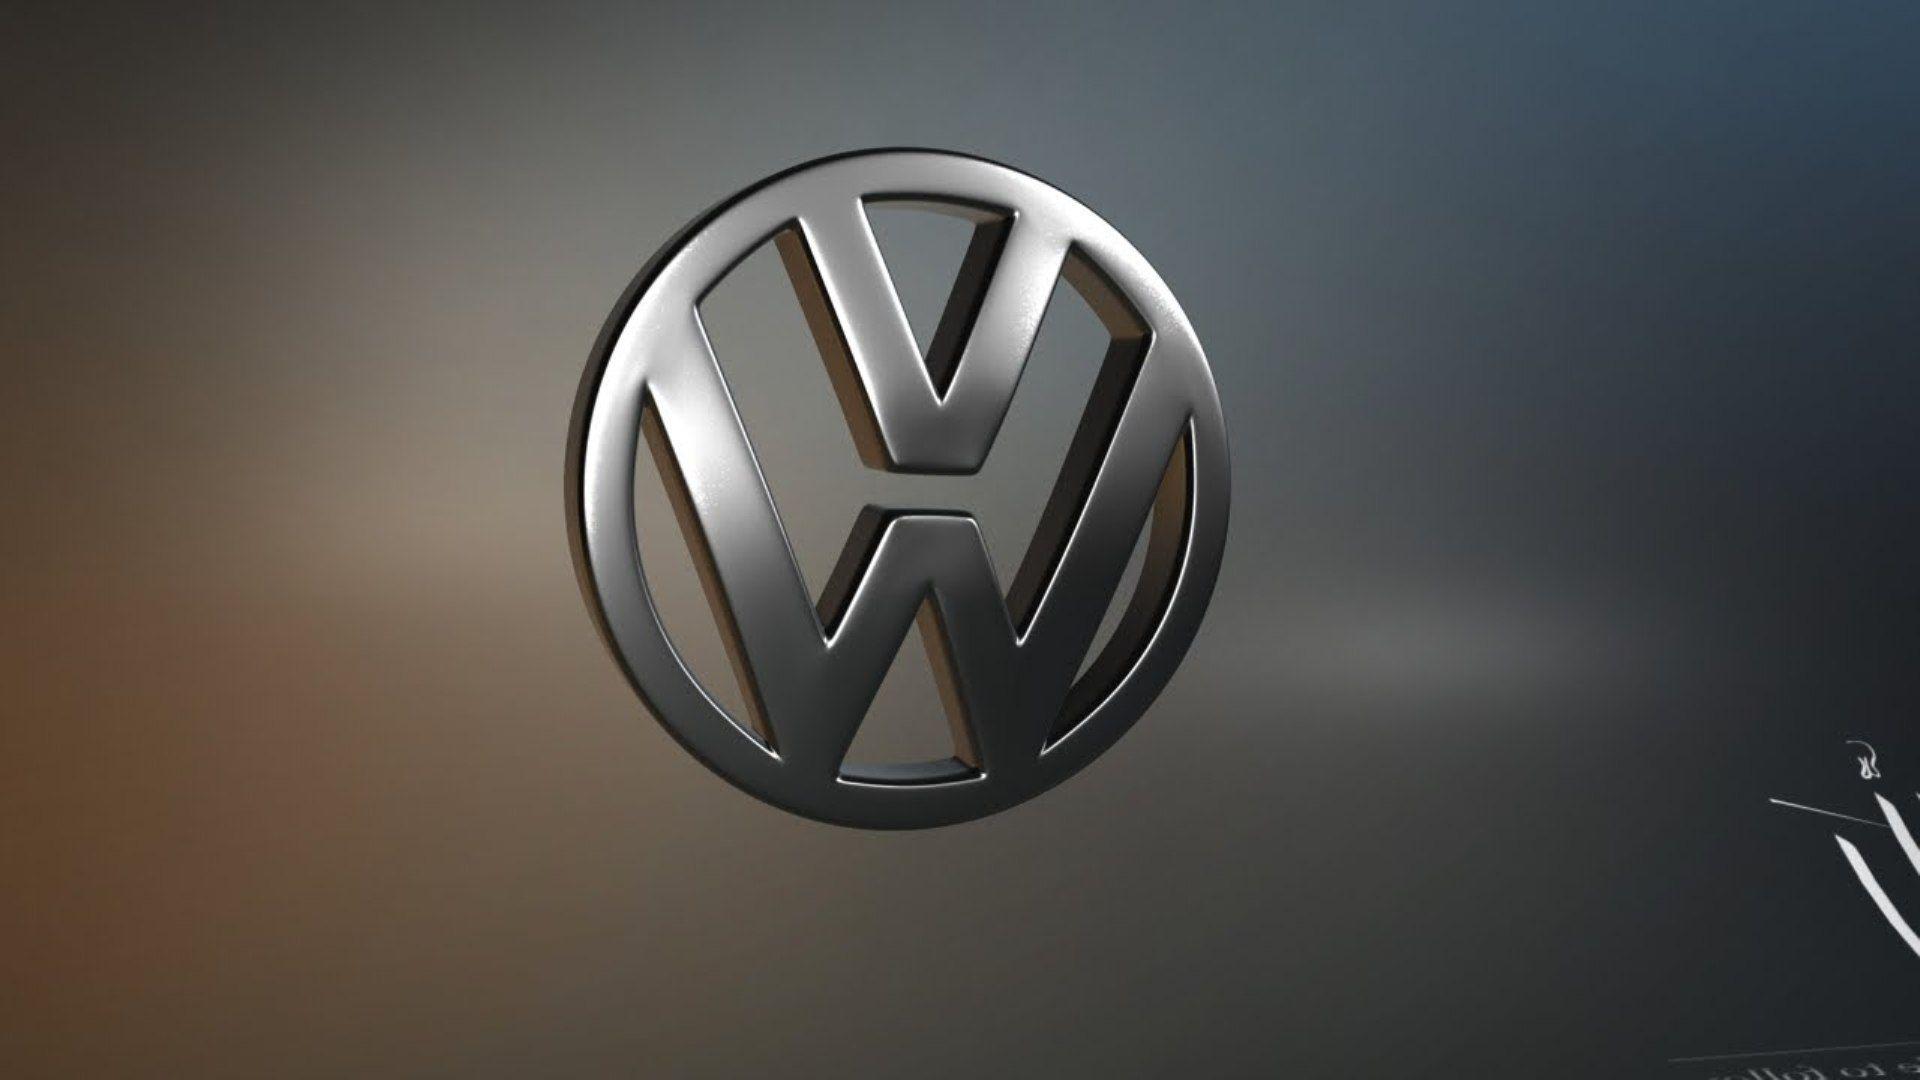 Volkswagen Wallpaper Picture 1yw Backgrounds Wallpapers Vw